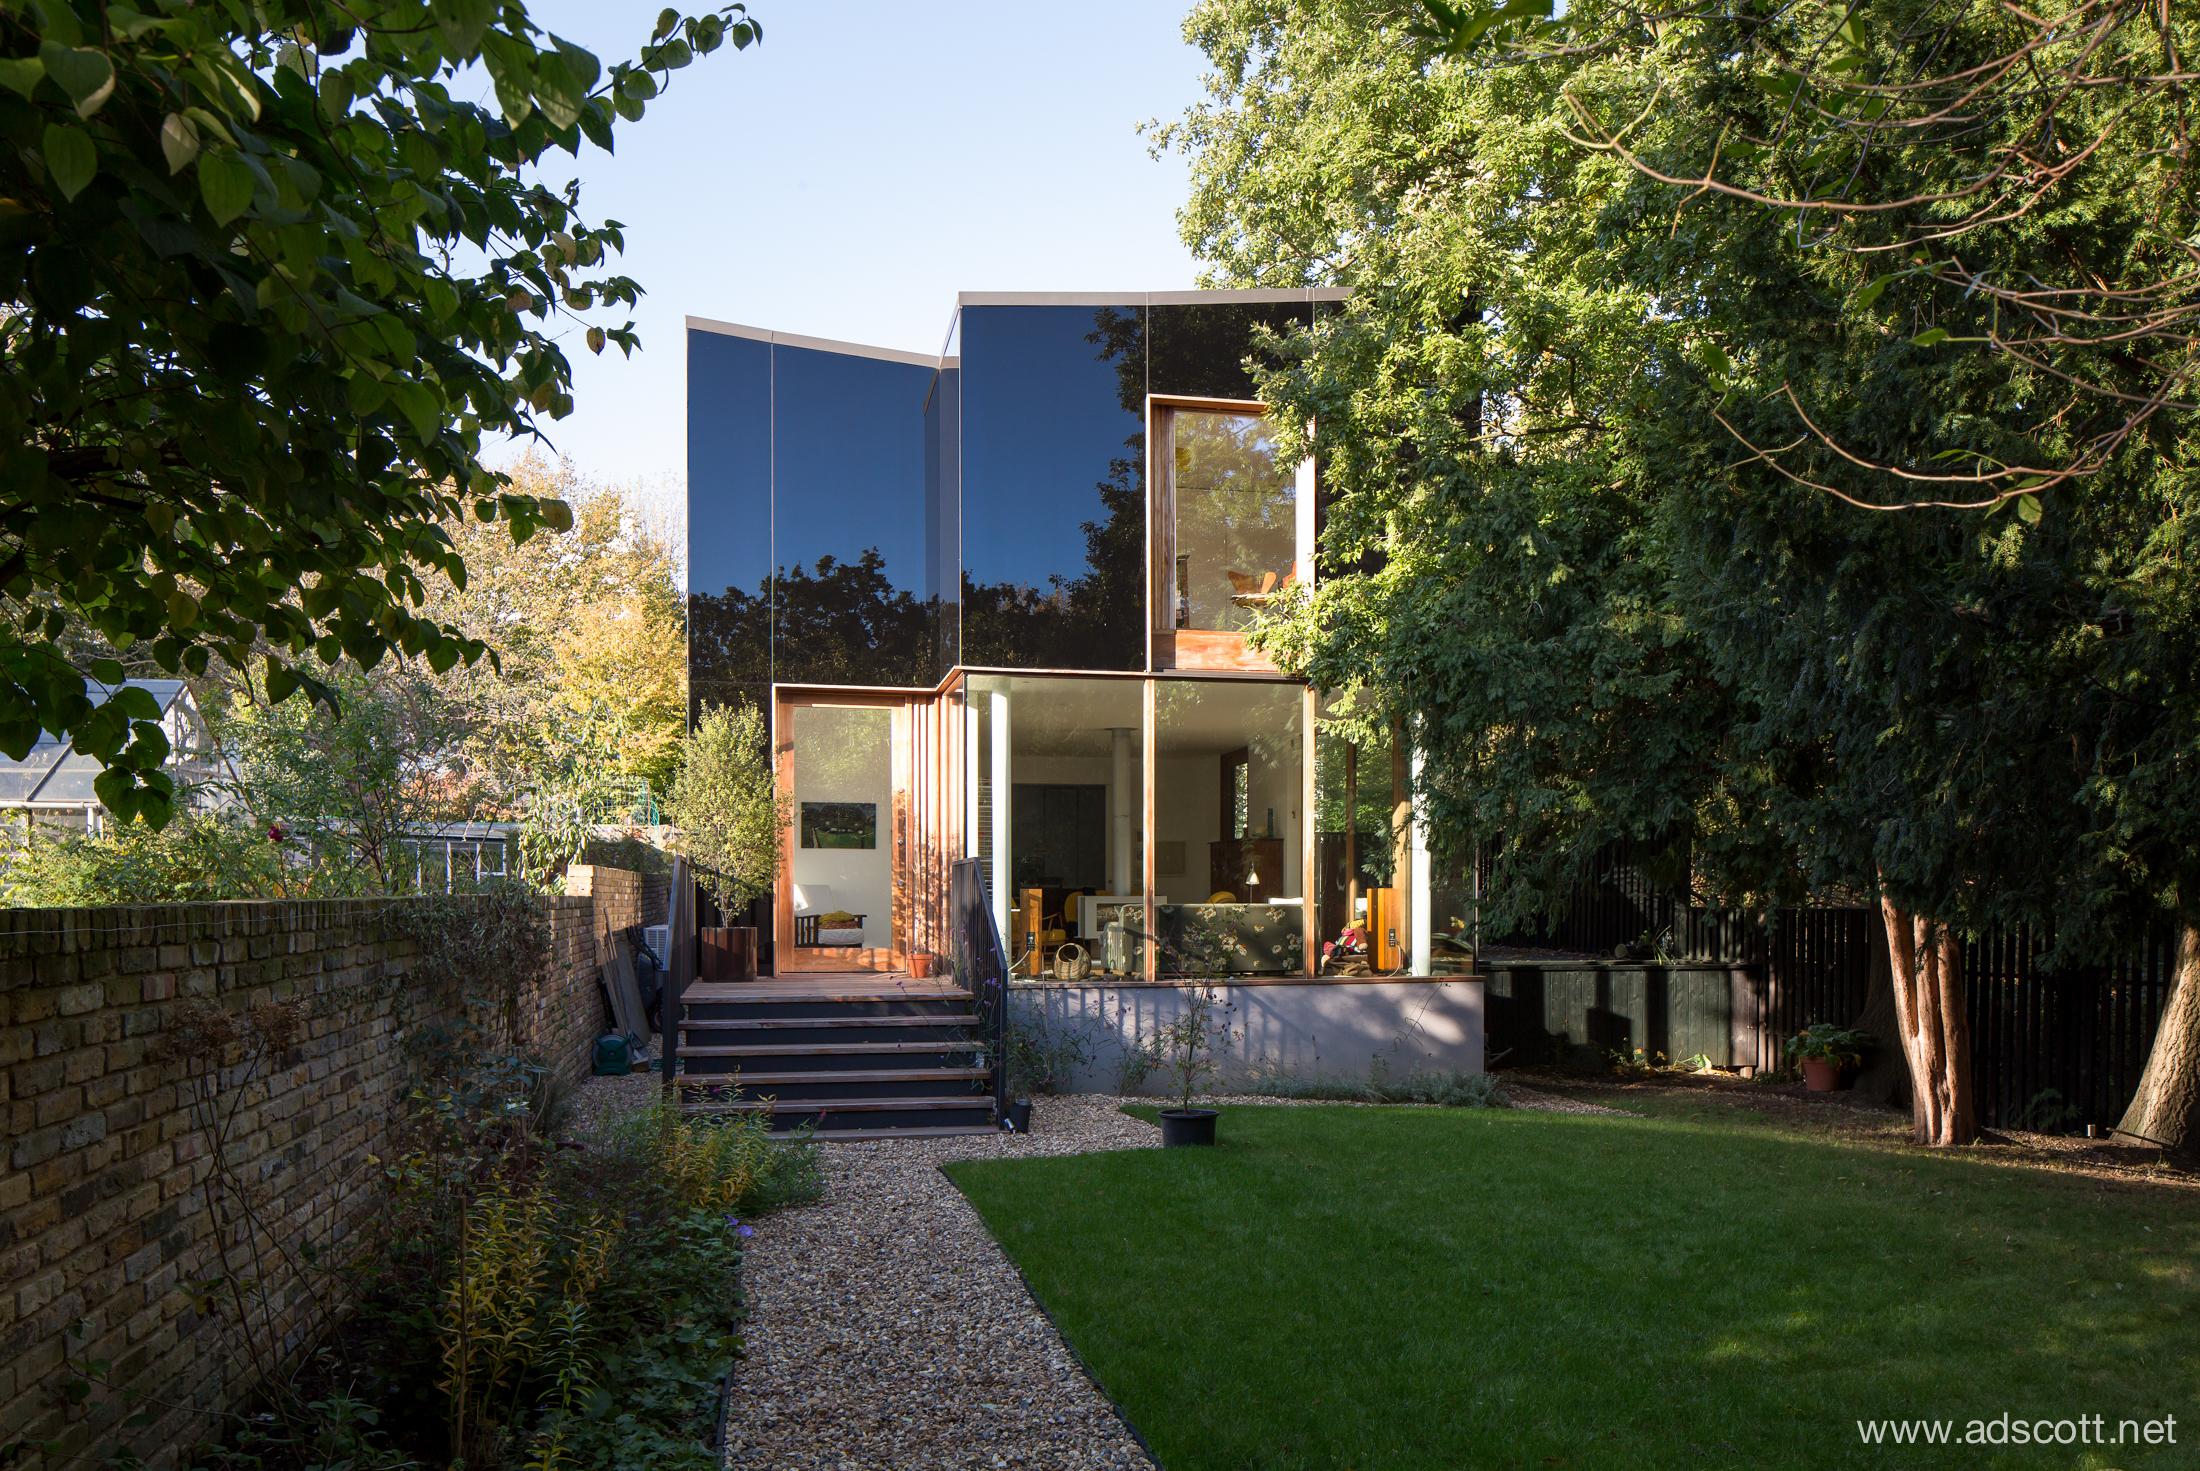 20141028-Tree_House_Ian_McChesney_01.jpg